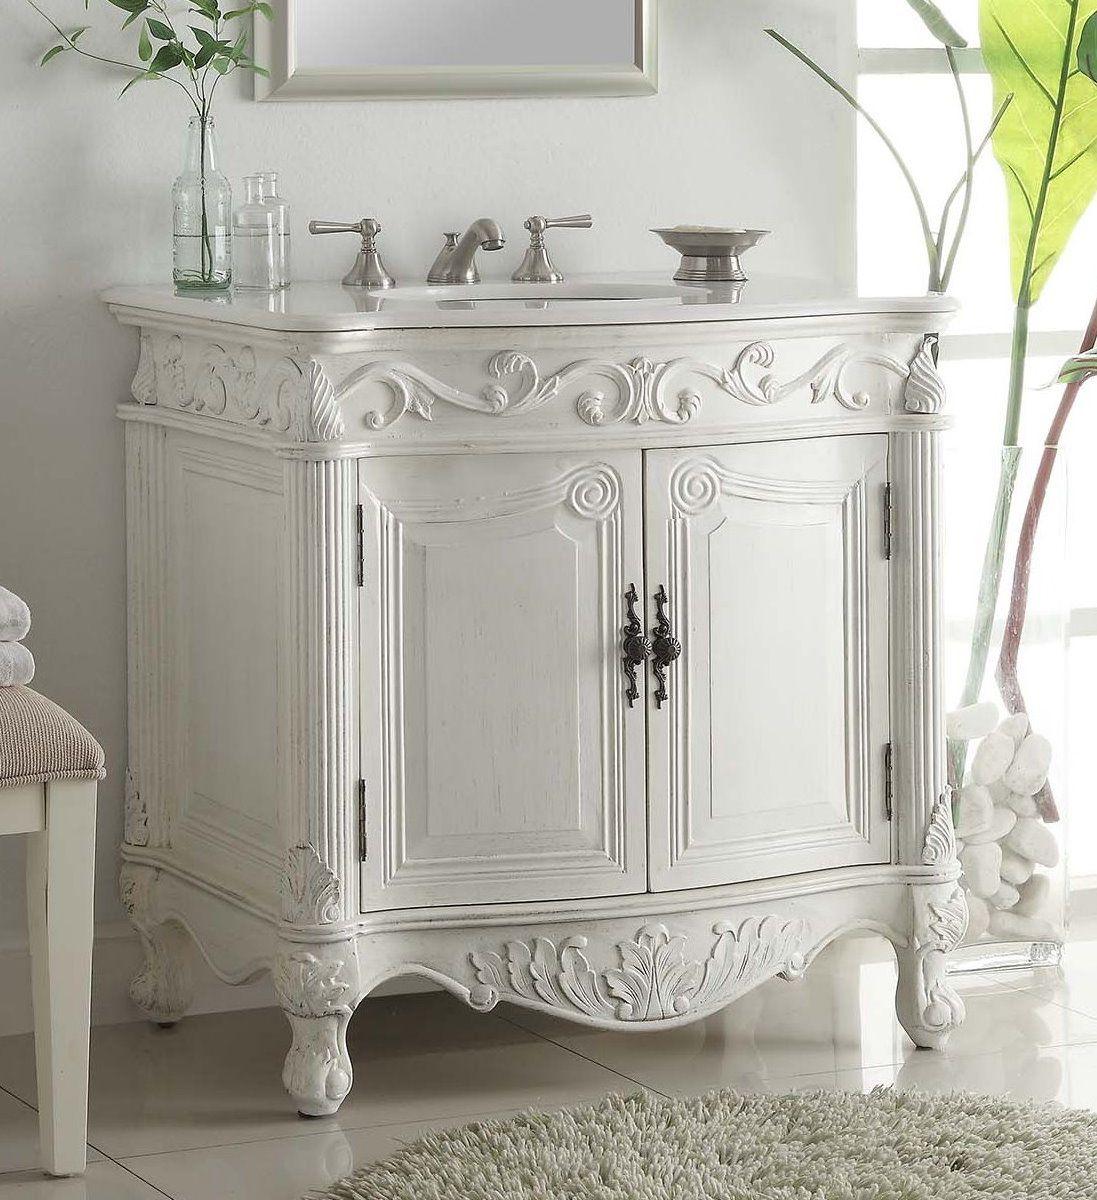 32 Inch Adelina Antique Bathroom Vanity White Finish Single